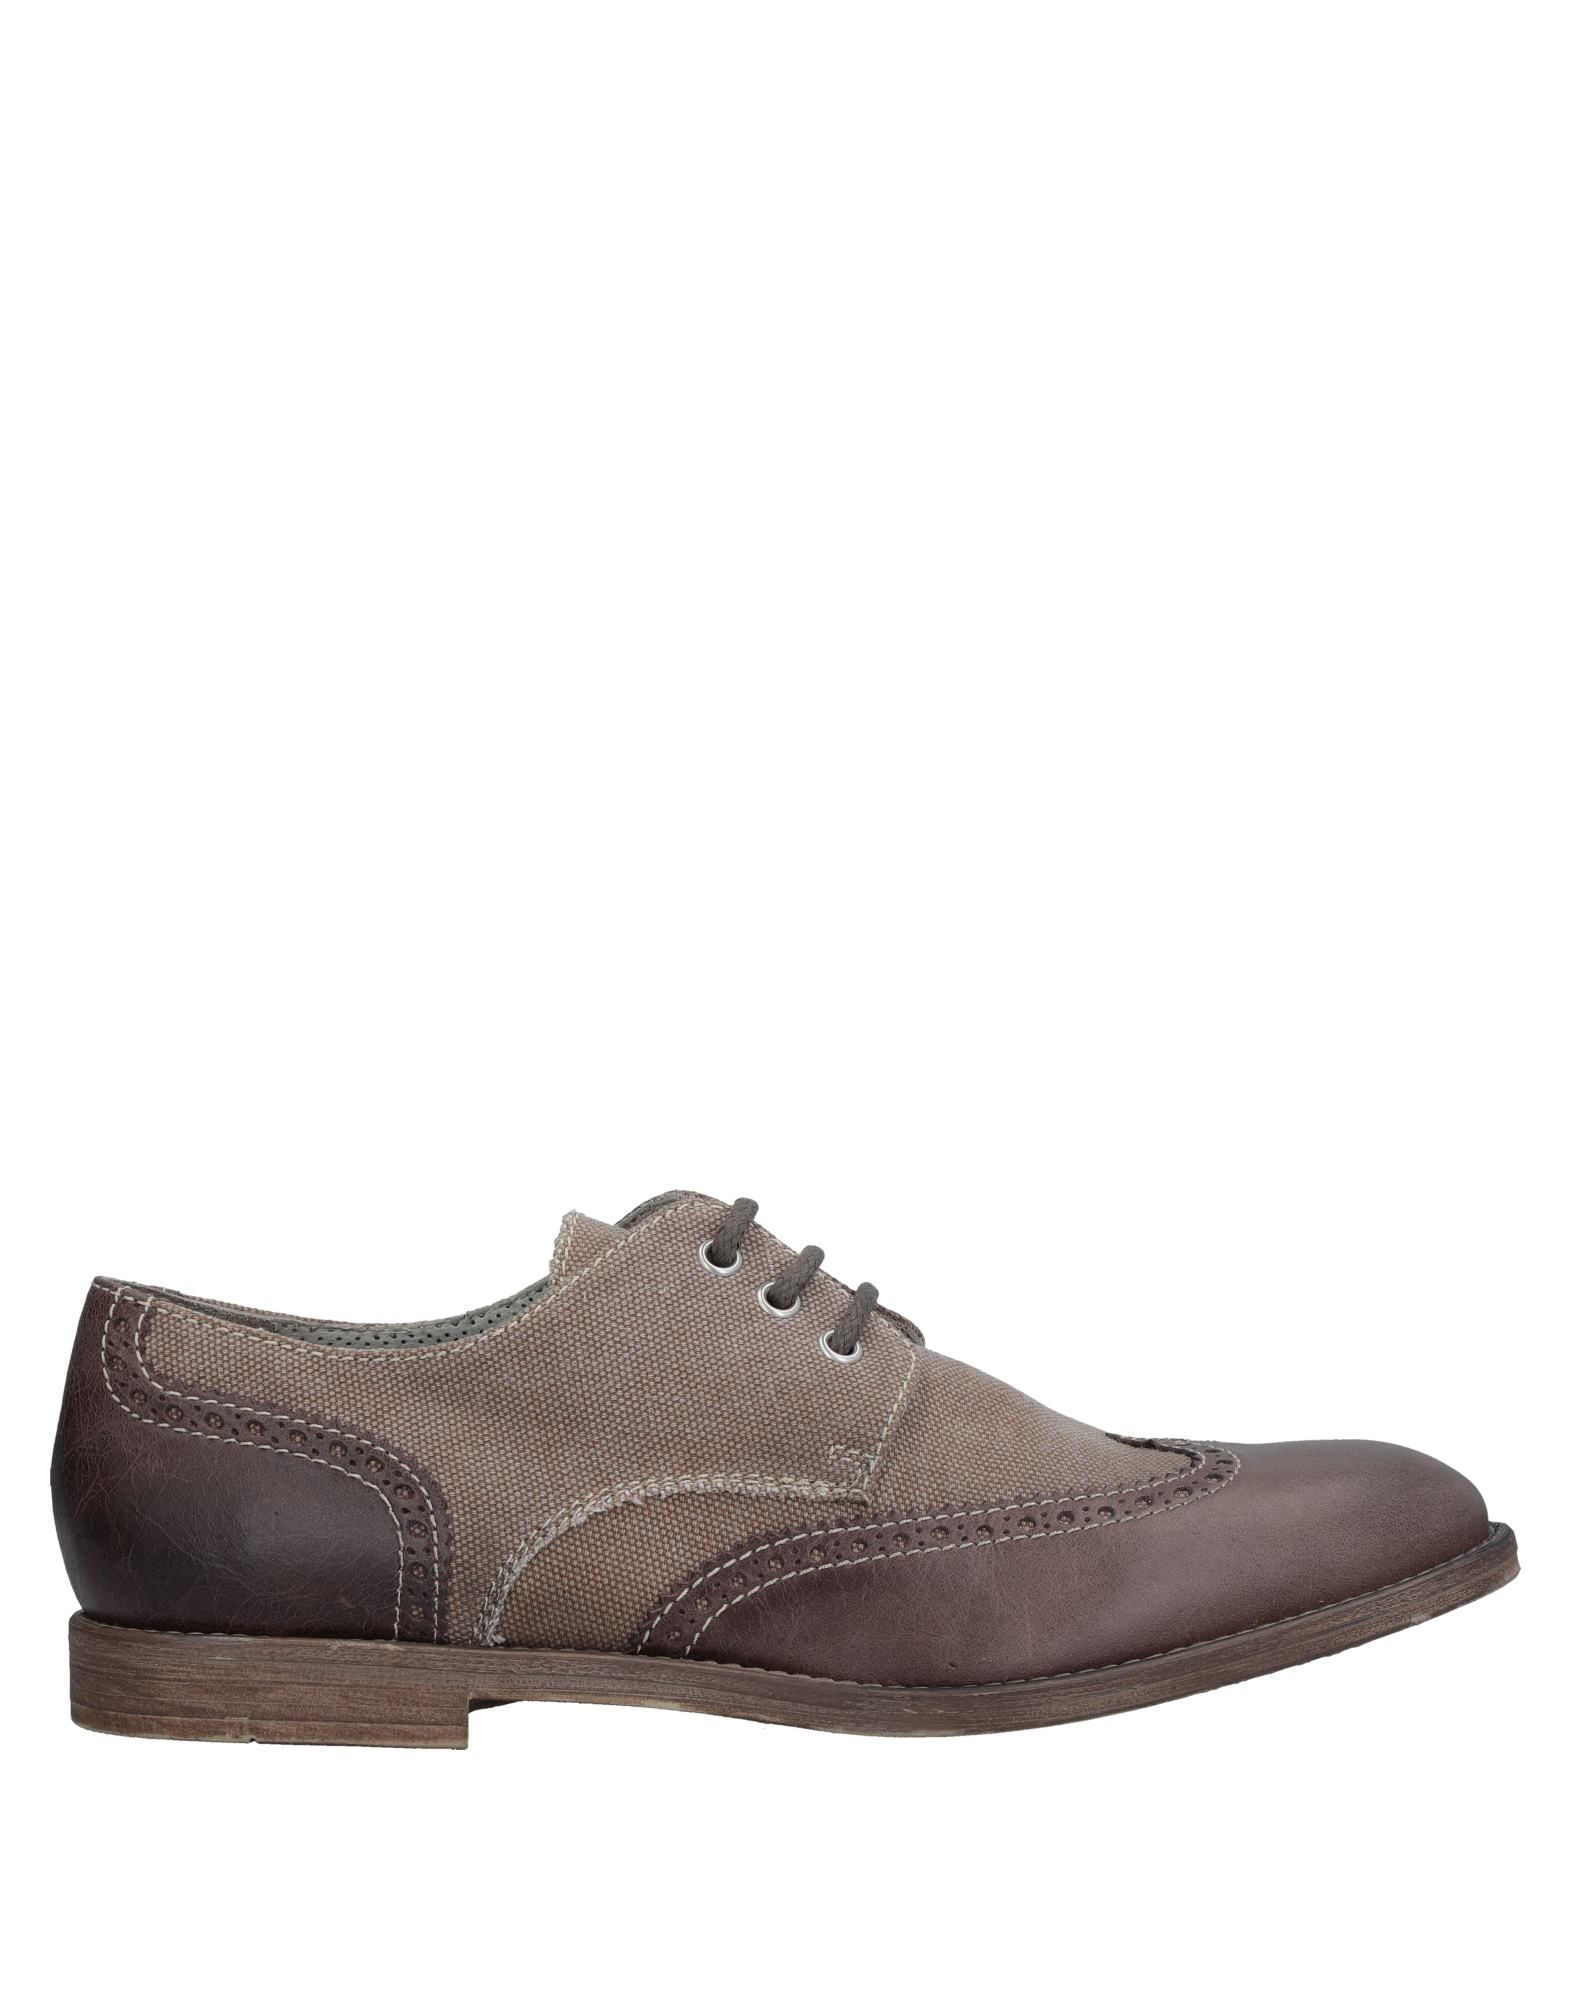 BELLO Обувь на шнурках первый внутри обувь обувь обувь обувь обувь обувь обувь обувь обувь 8a2549 мужская армия green 40 метров